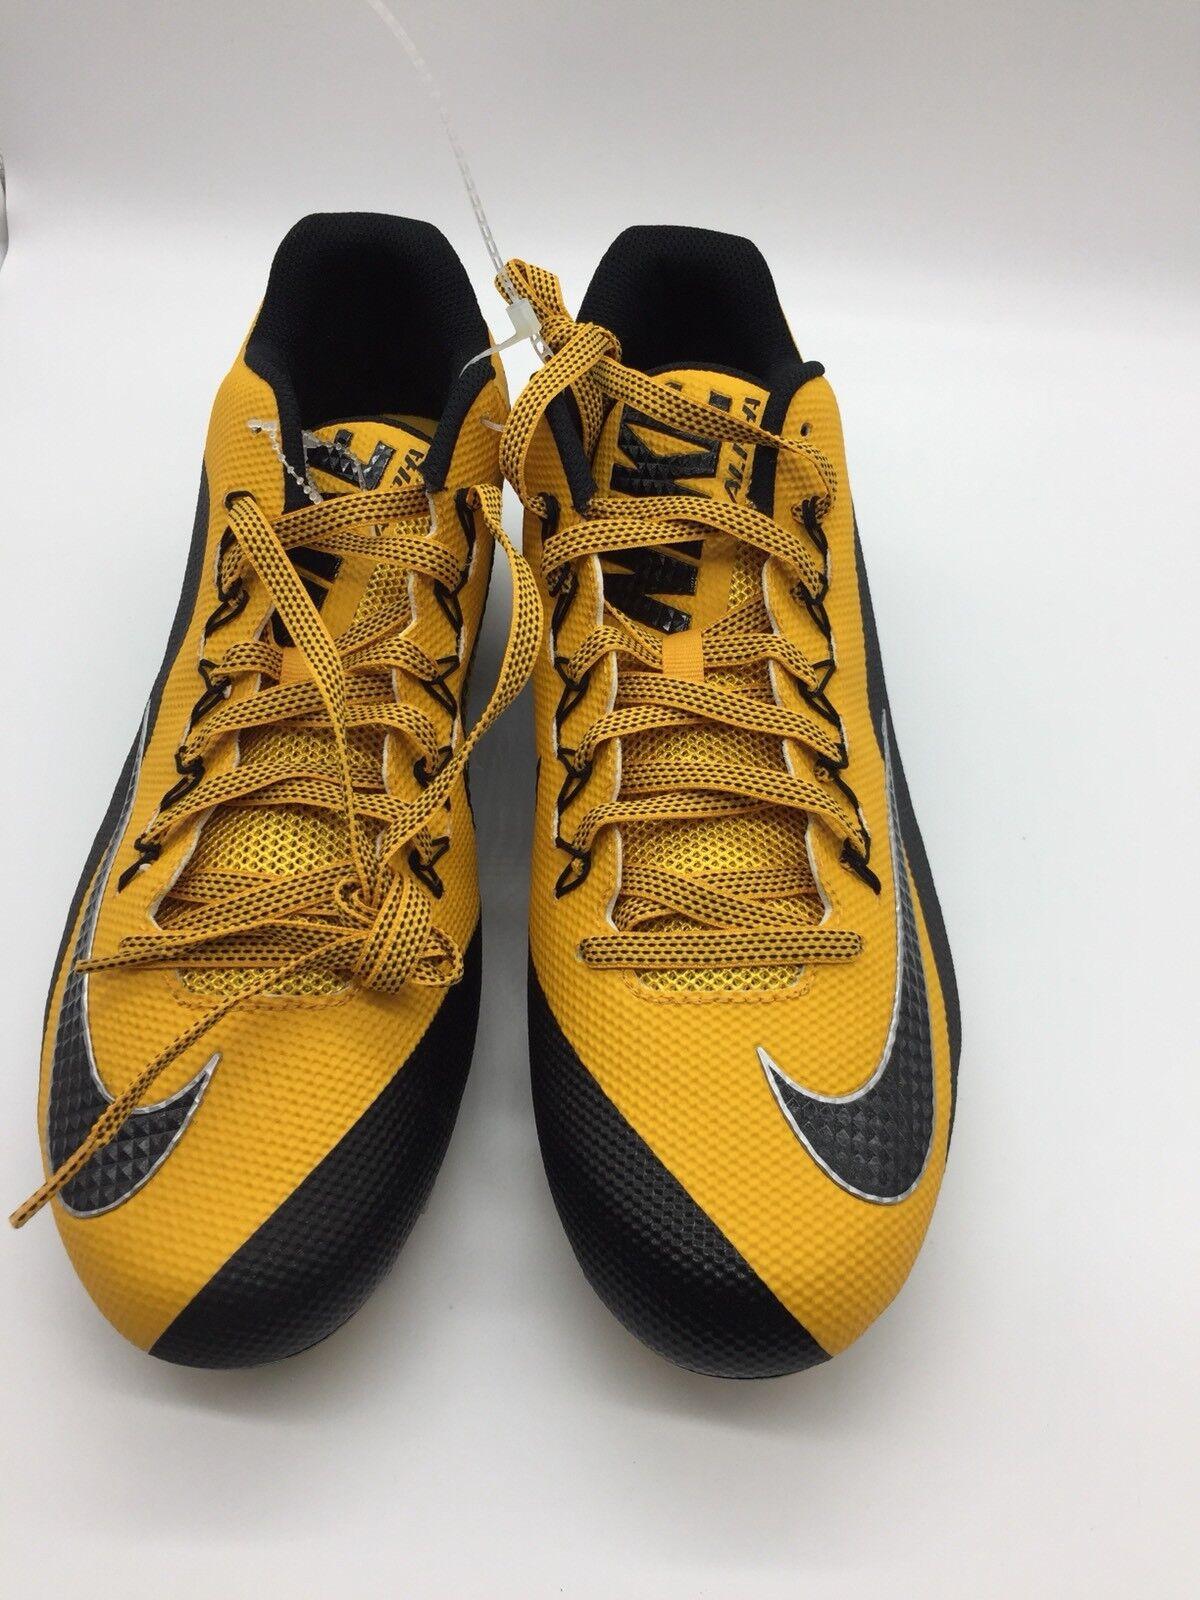 Nike Alpha Pro Football 2 TD PF Yellow Football Pro Cleats Shoes 729445-725 Size 14 a6a5f7